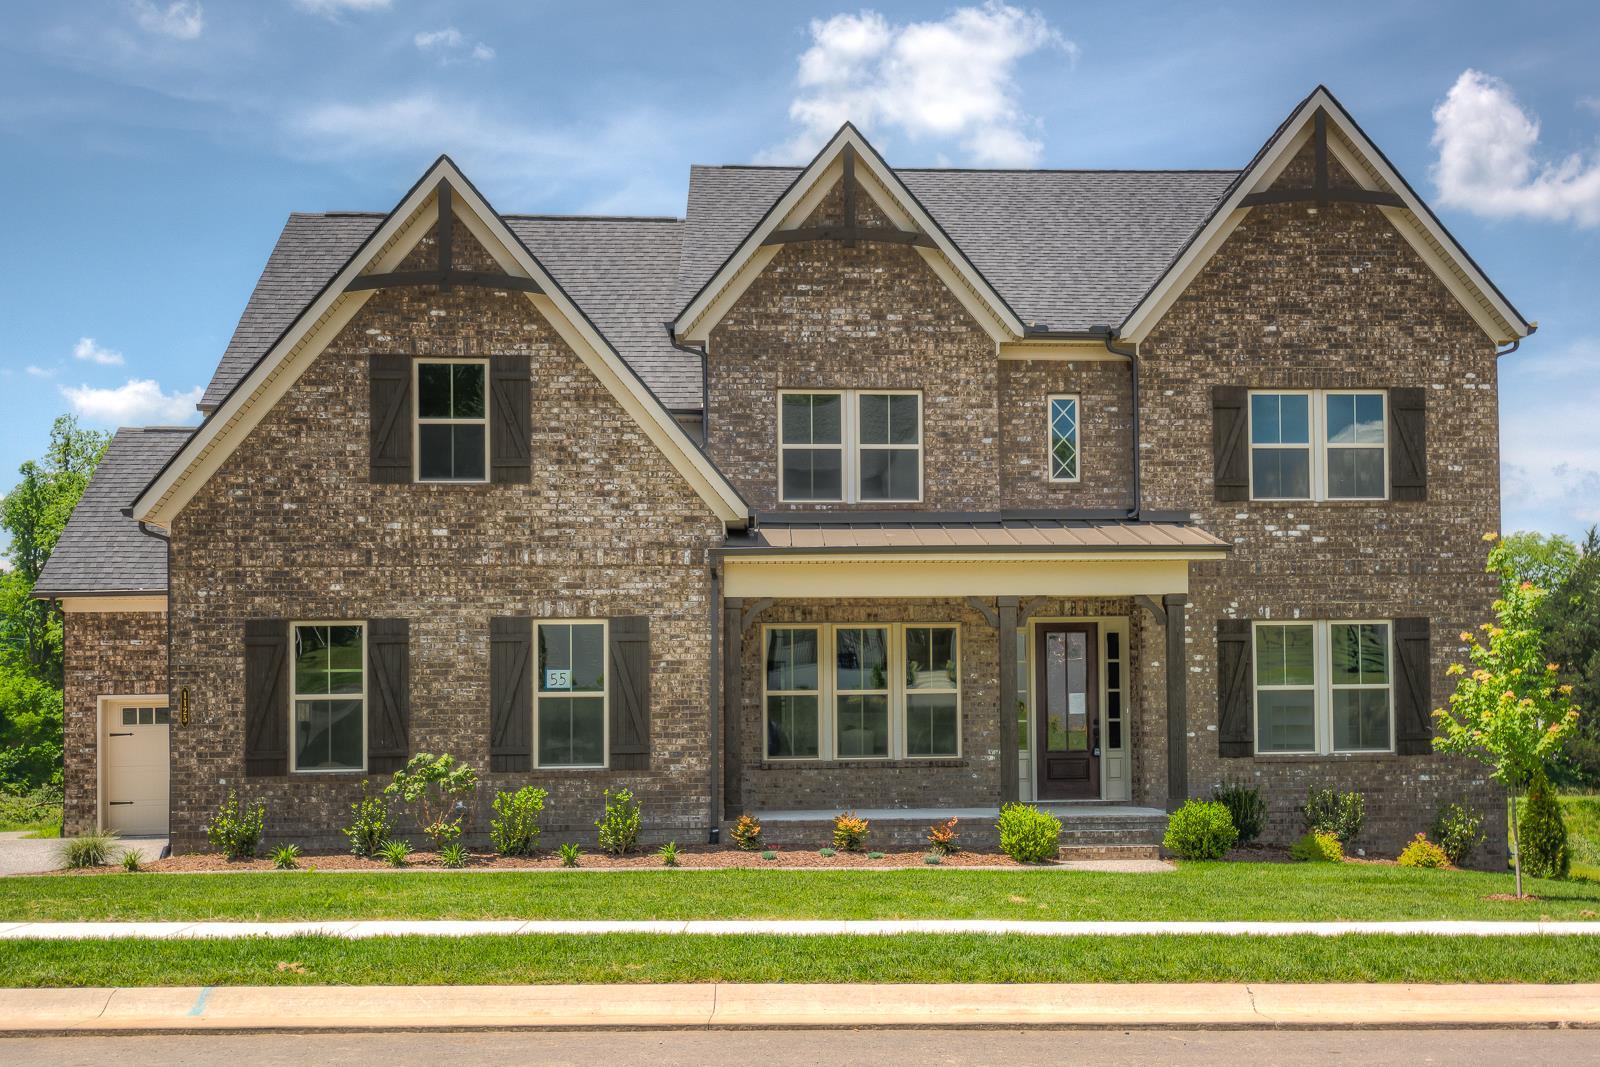 1125 McClellan Ln, Nolensville, TN 37135 - Nolensville, TN real estate listing